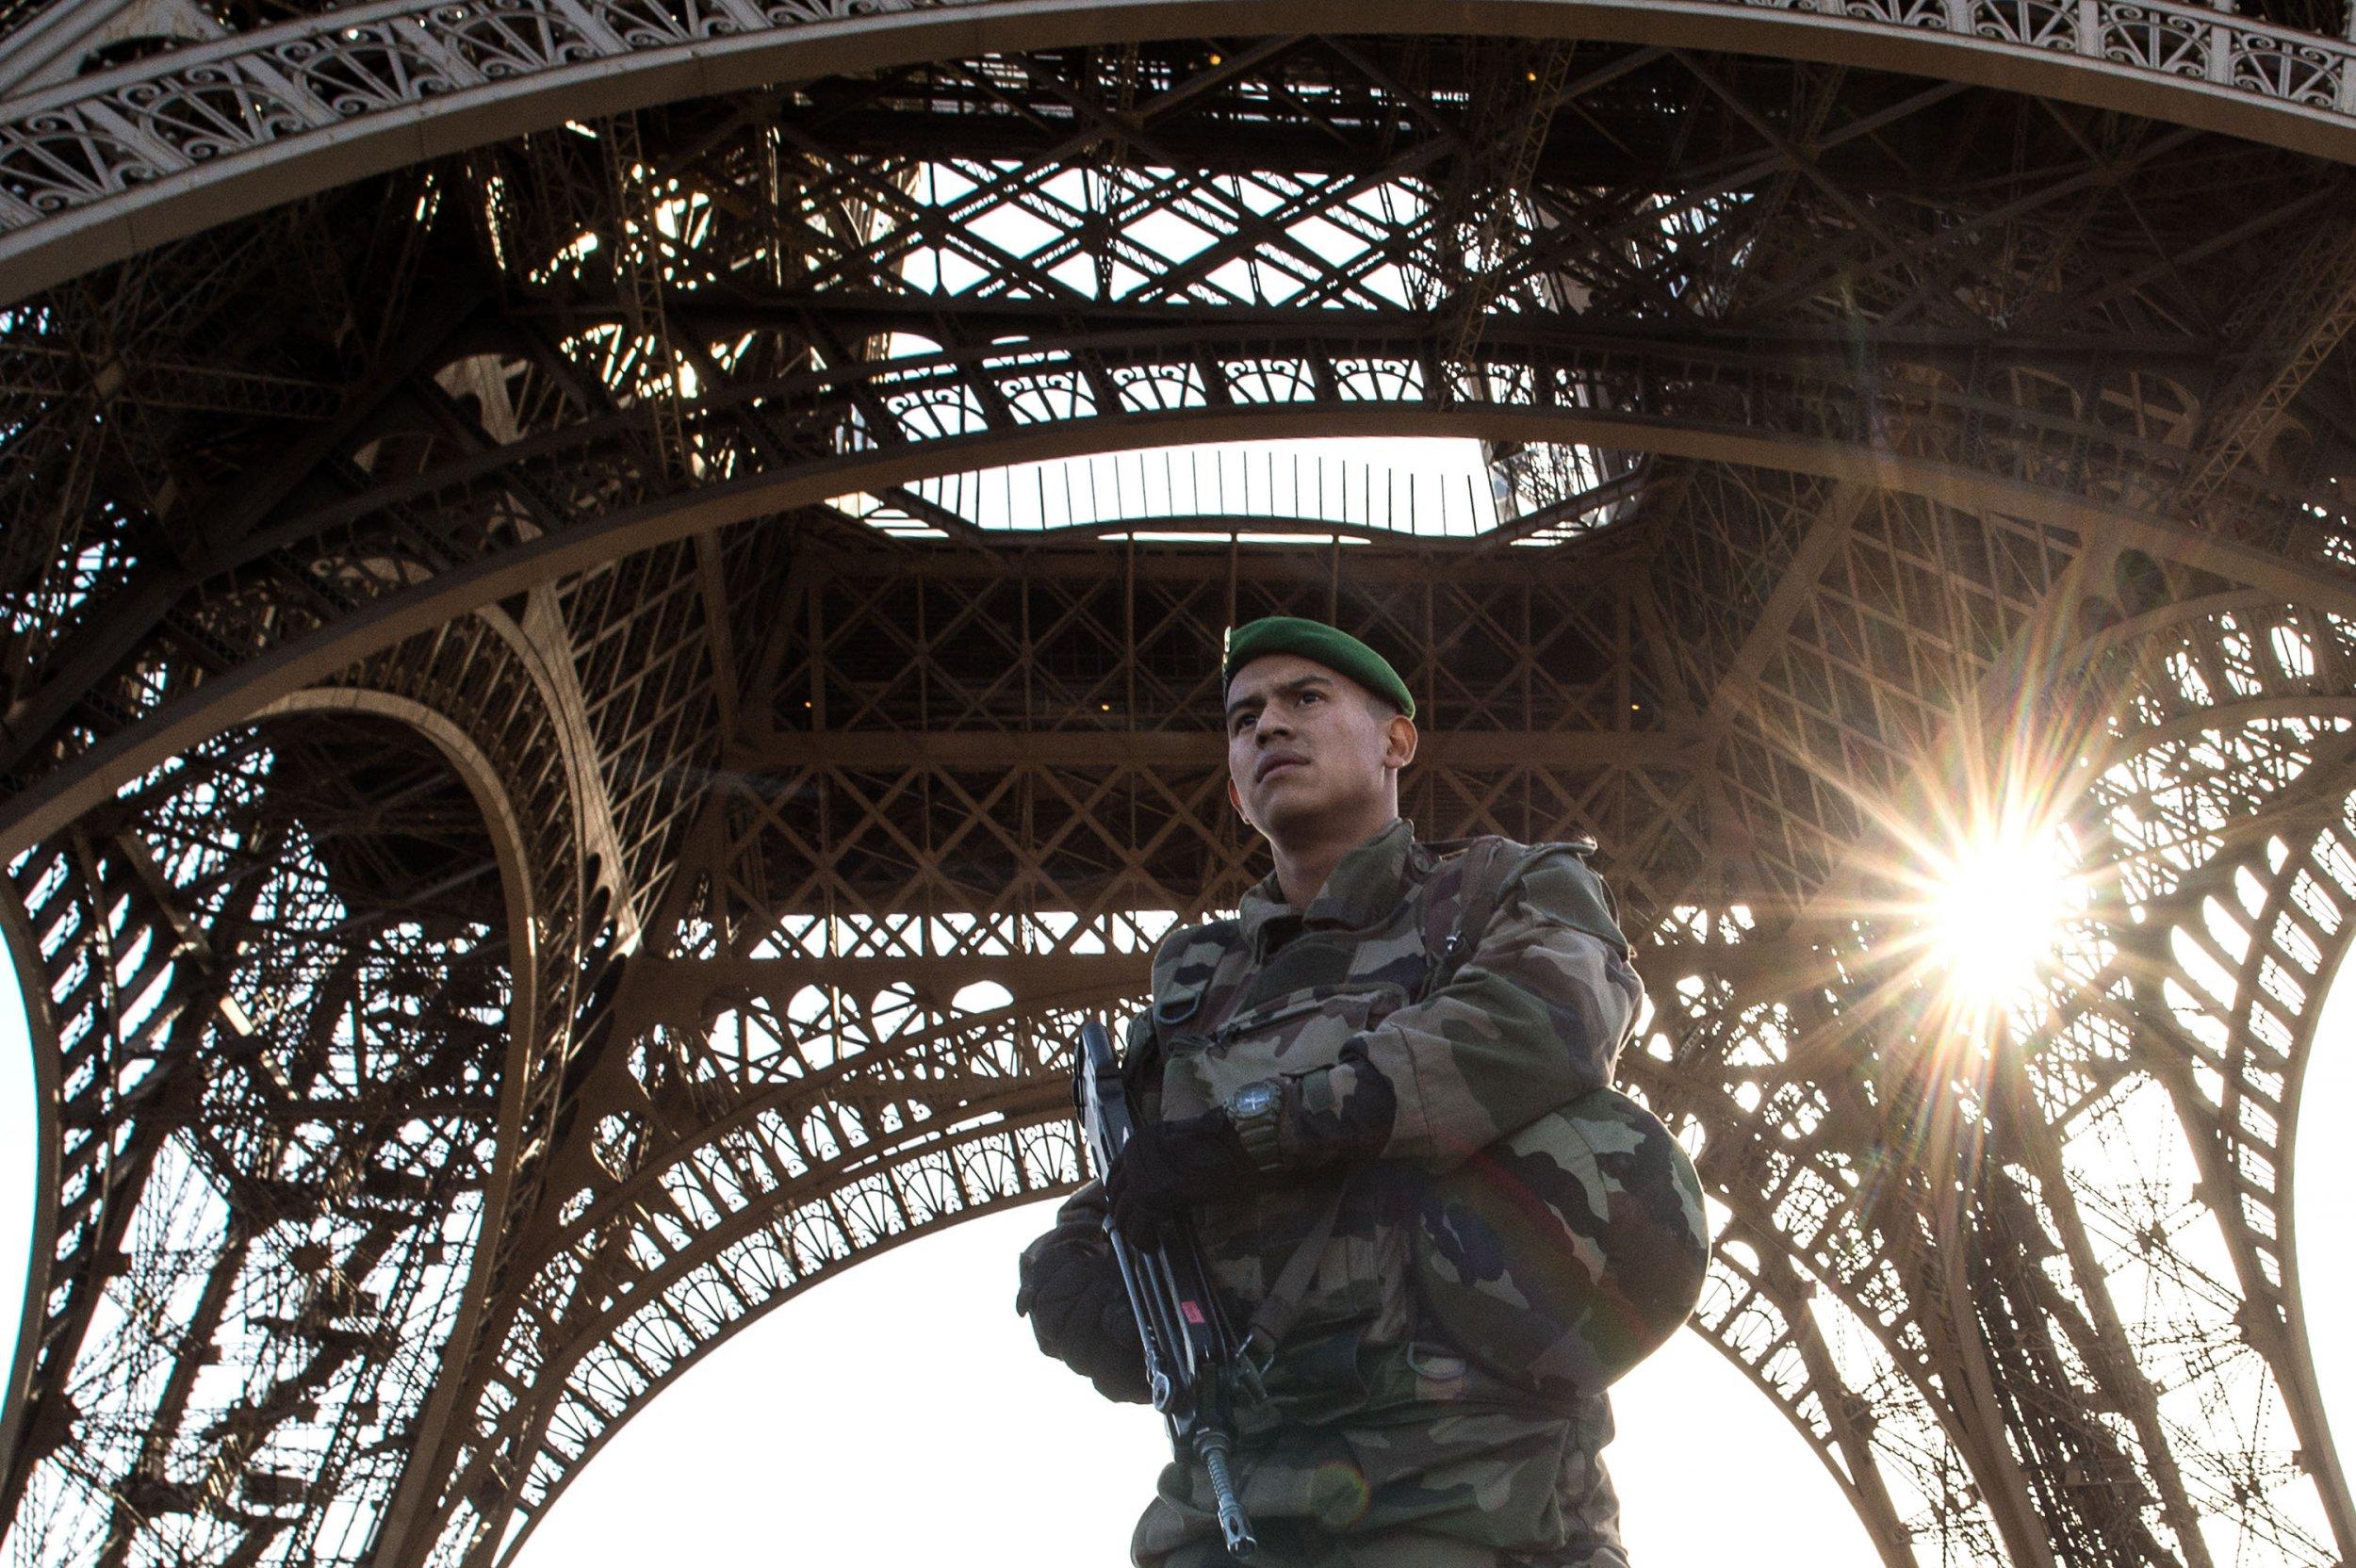 Paris Attacks France Eiffel